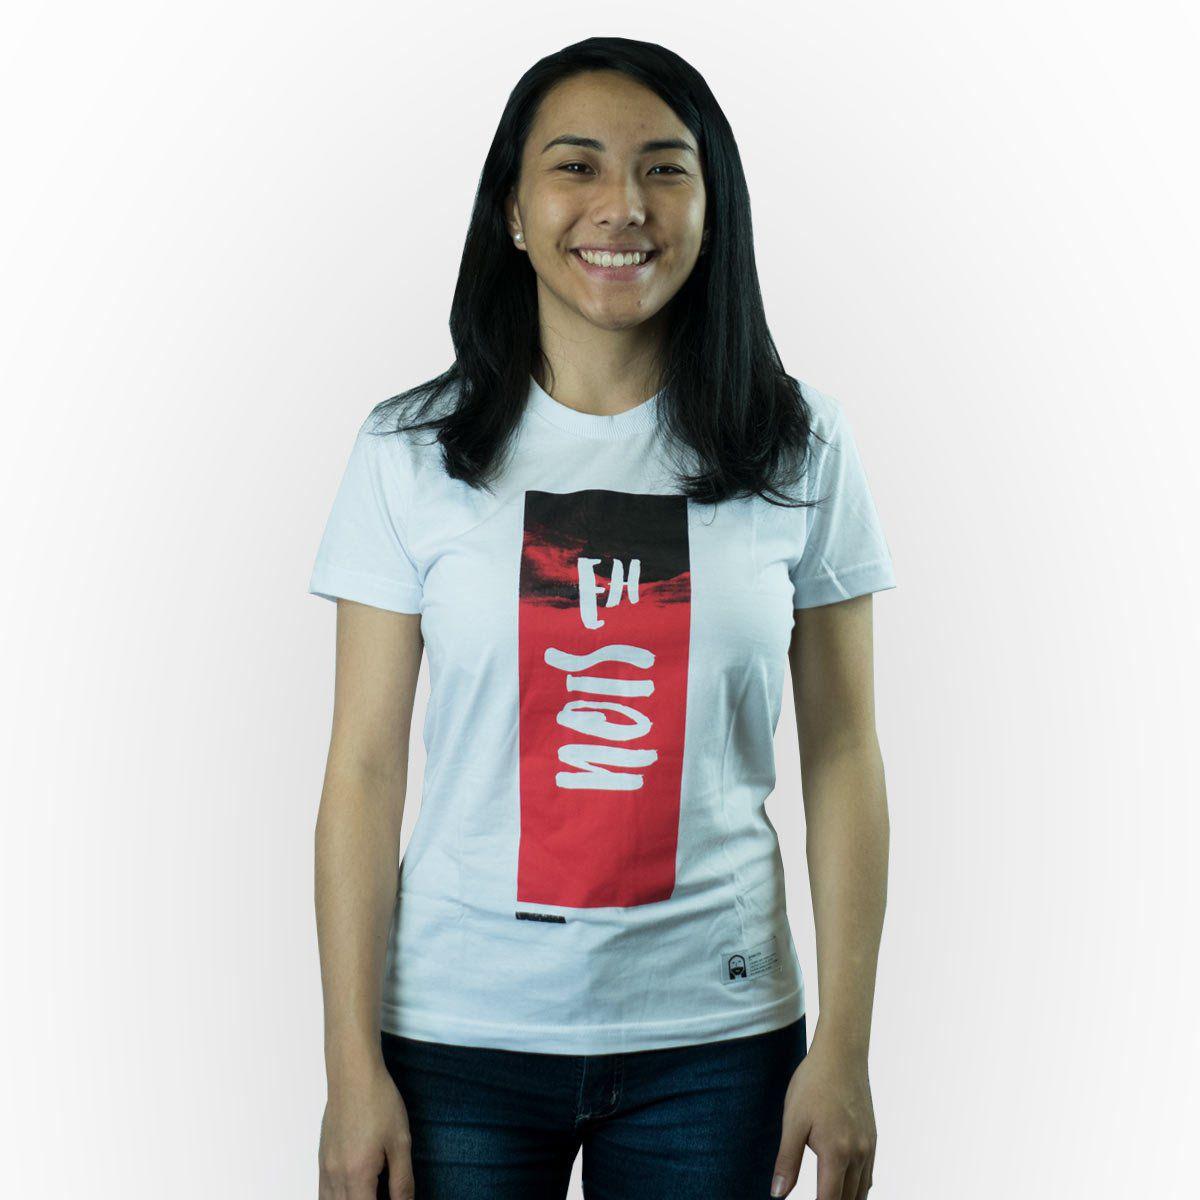 Camiseta EhNois Branca Fem.   - JesusCopy